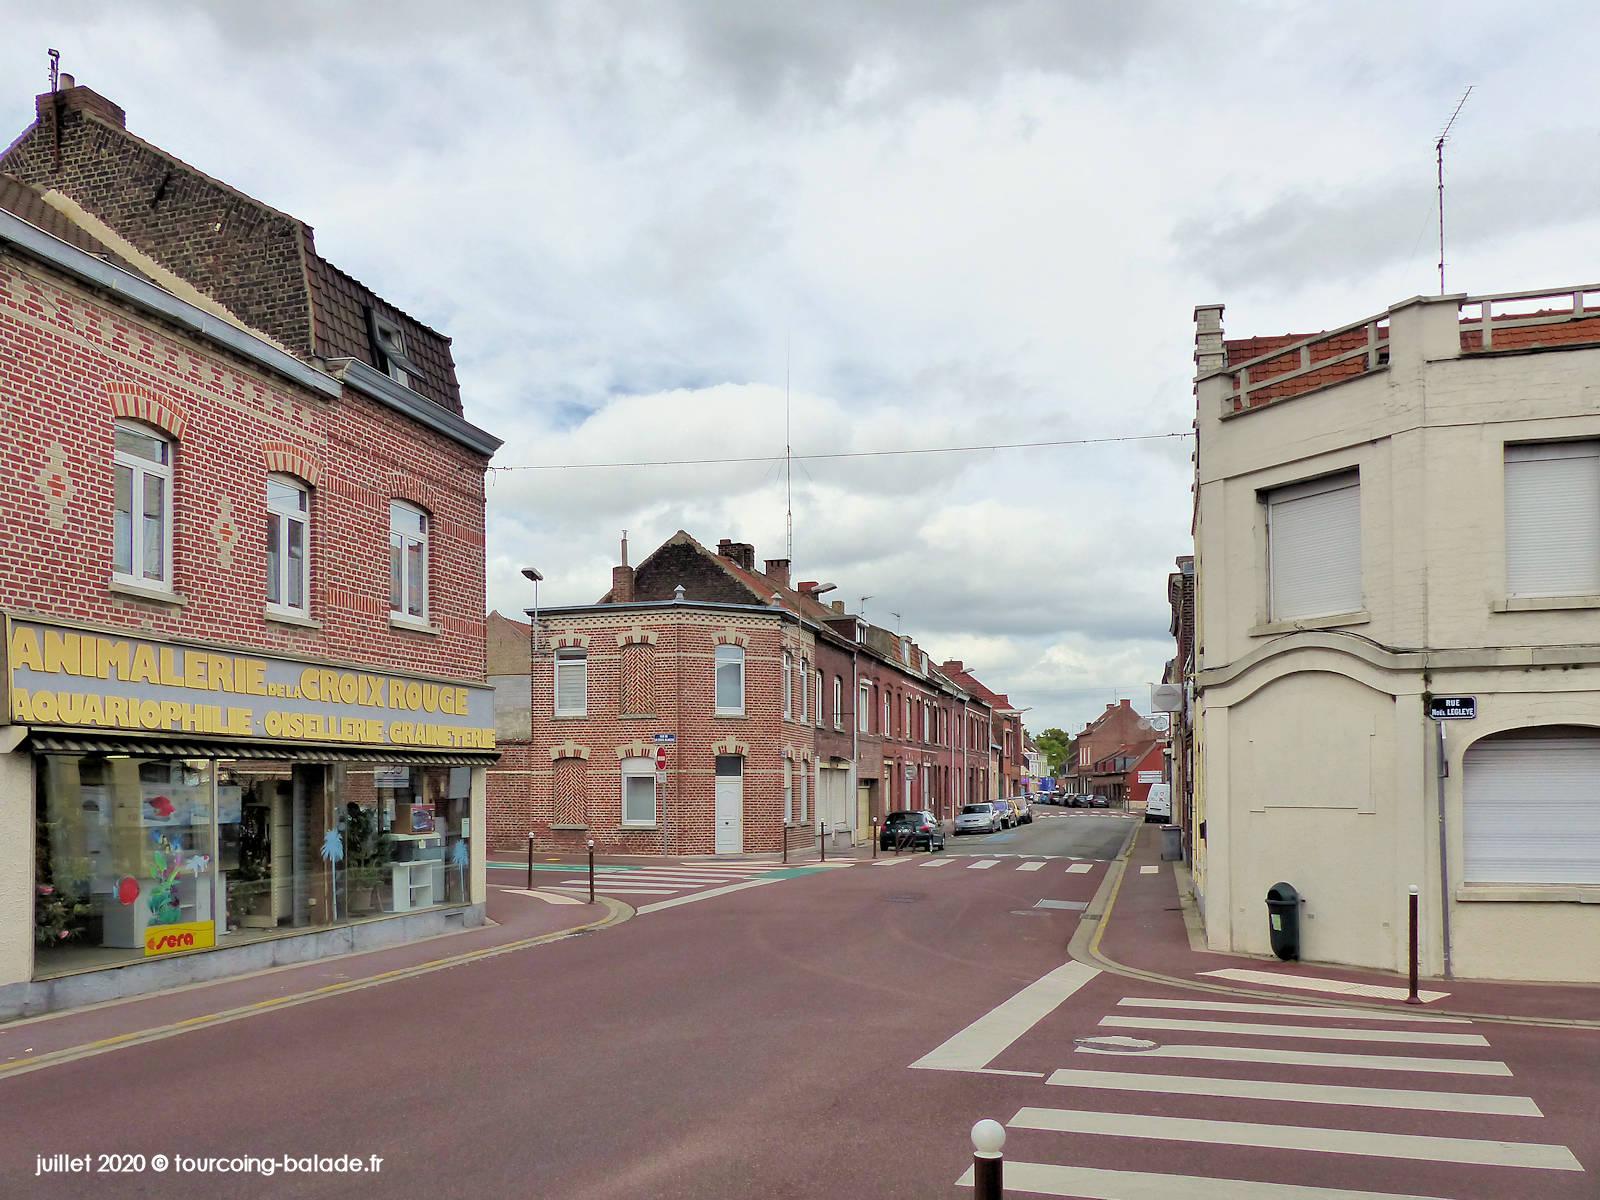 Rue de la Croix-Rouge, Tourcoing 2020 - Animalerie